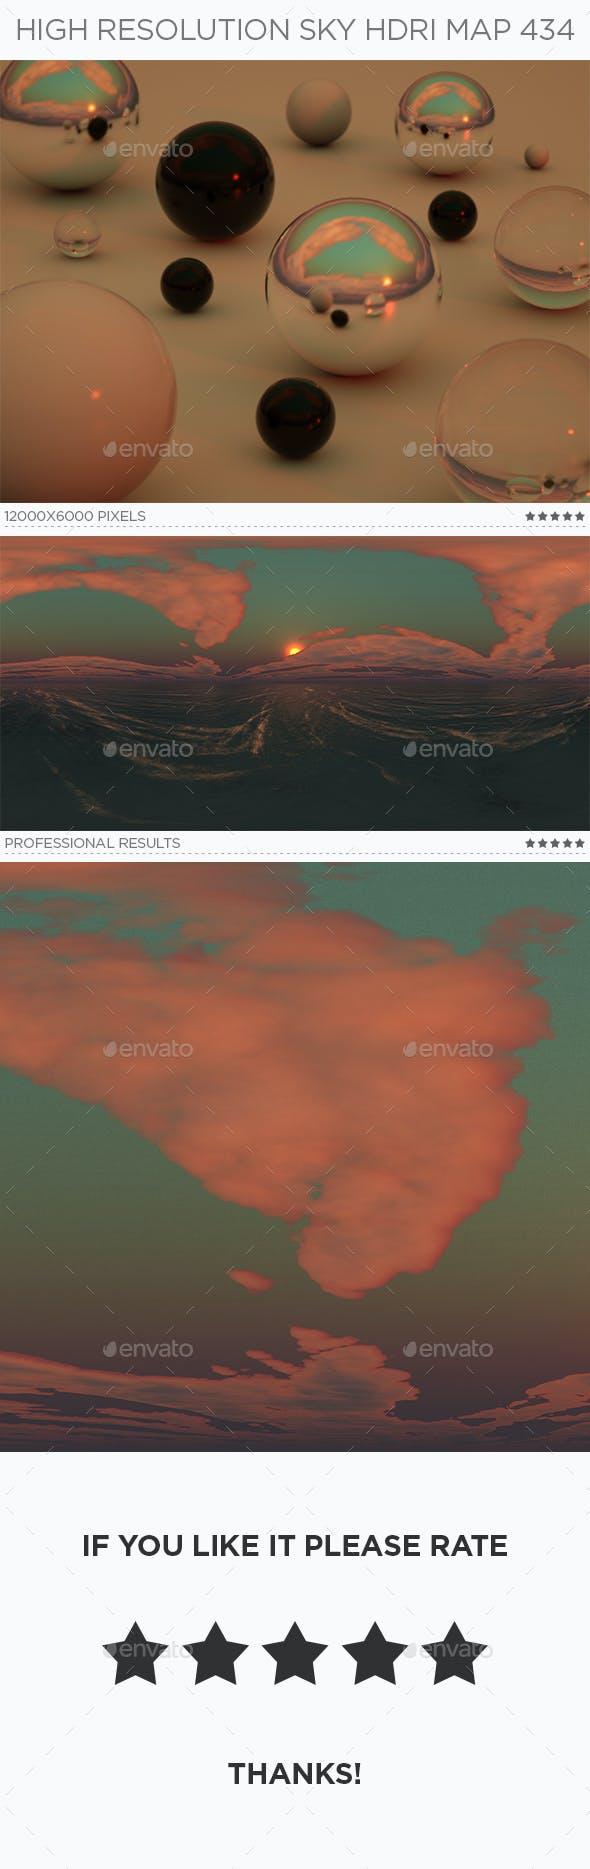 High Resolution Sky HDRi Map 434 - 3DOcean Item for Sale